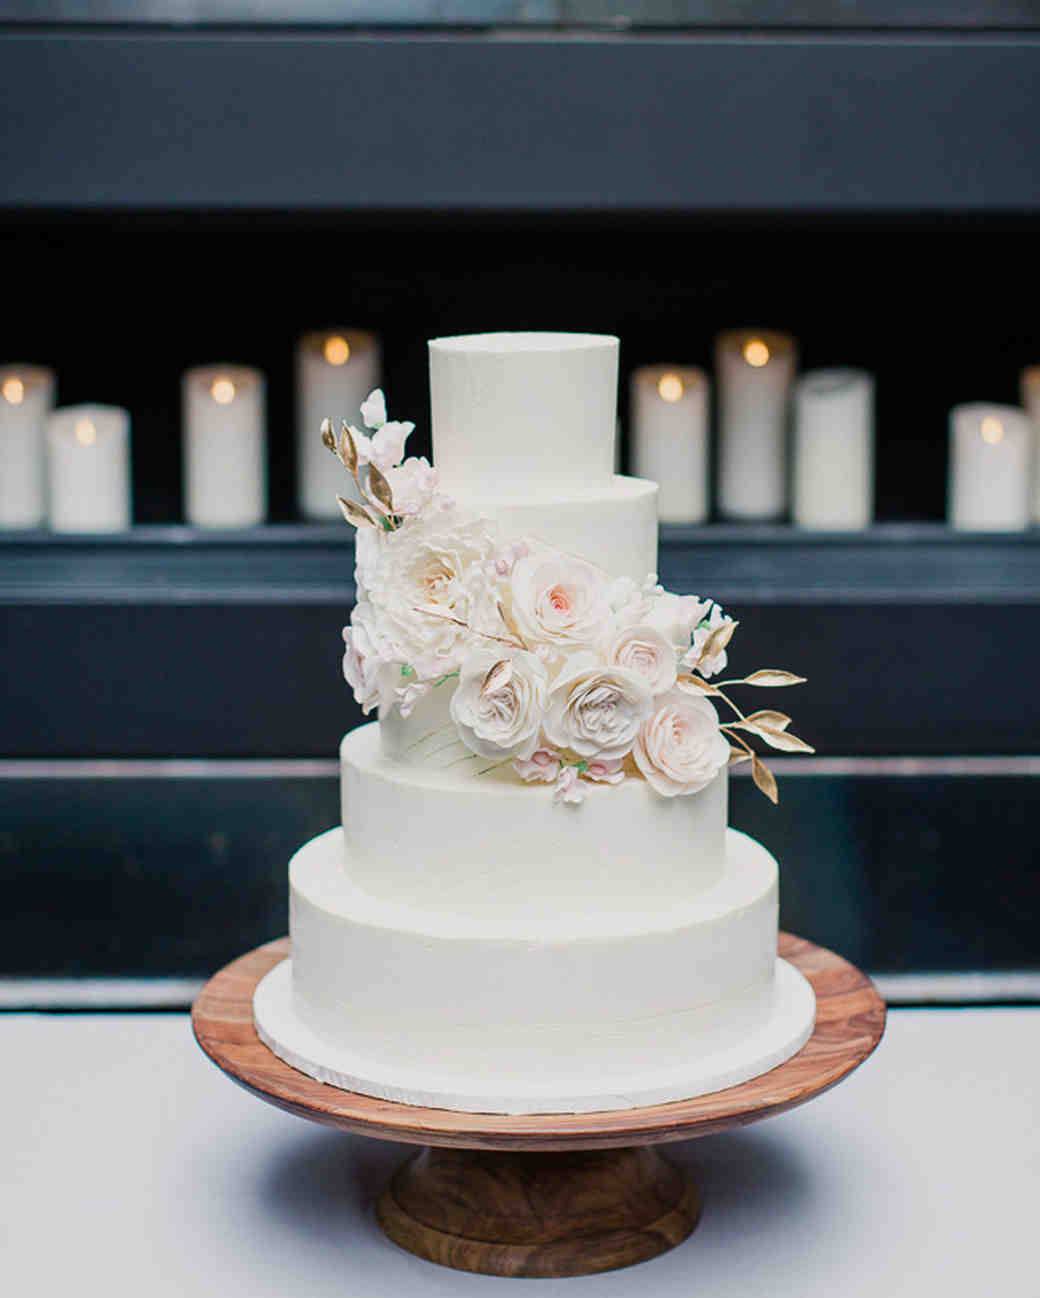 makers Amateur wedding cake